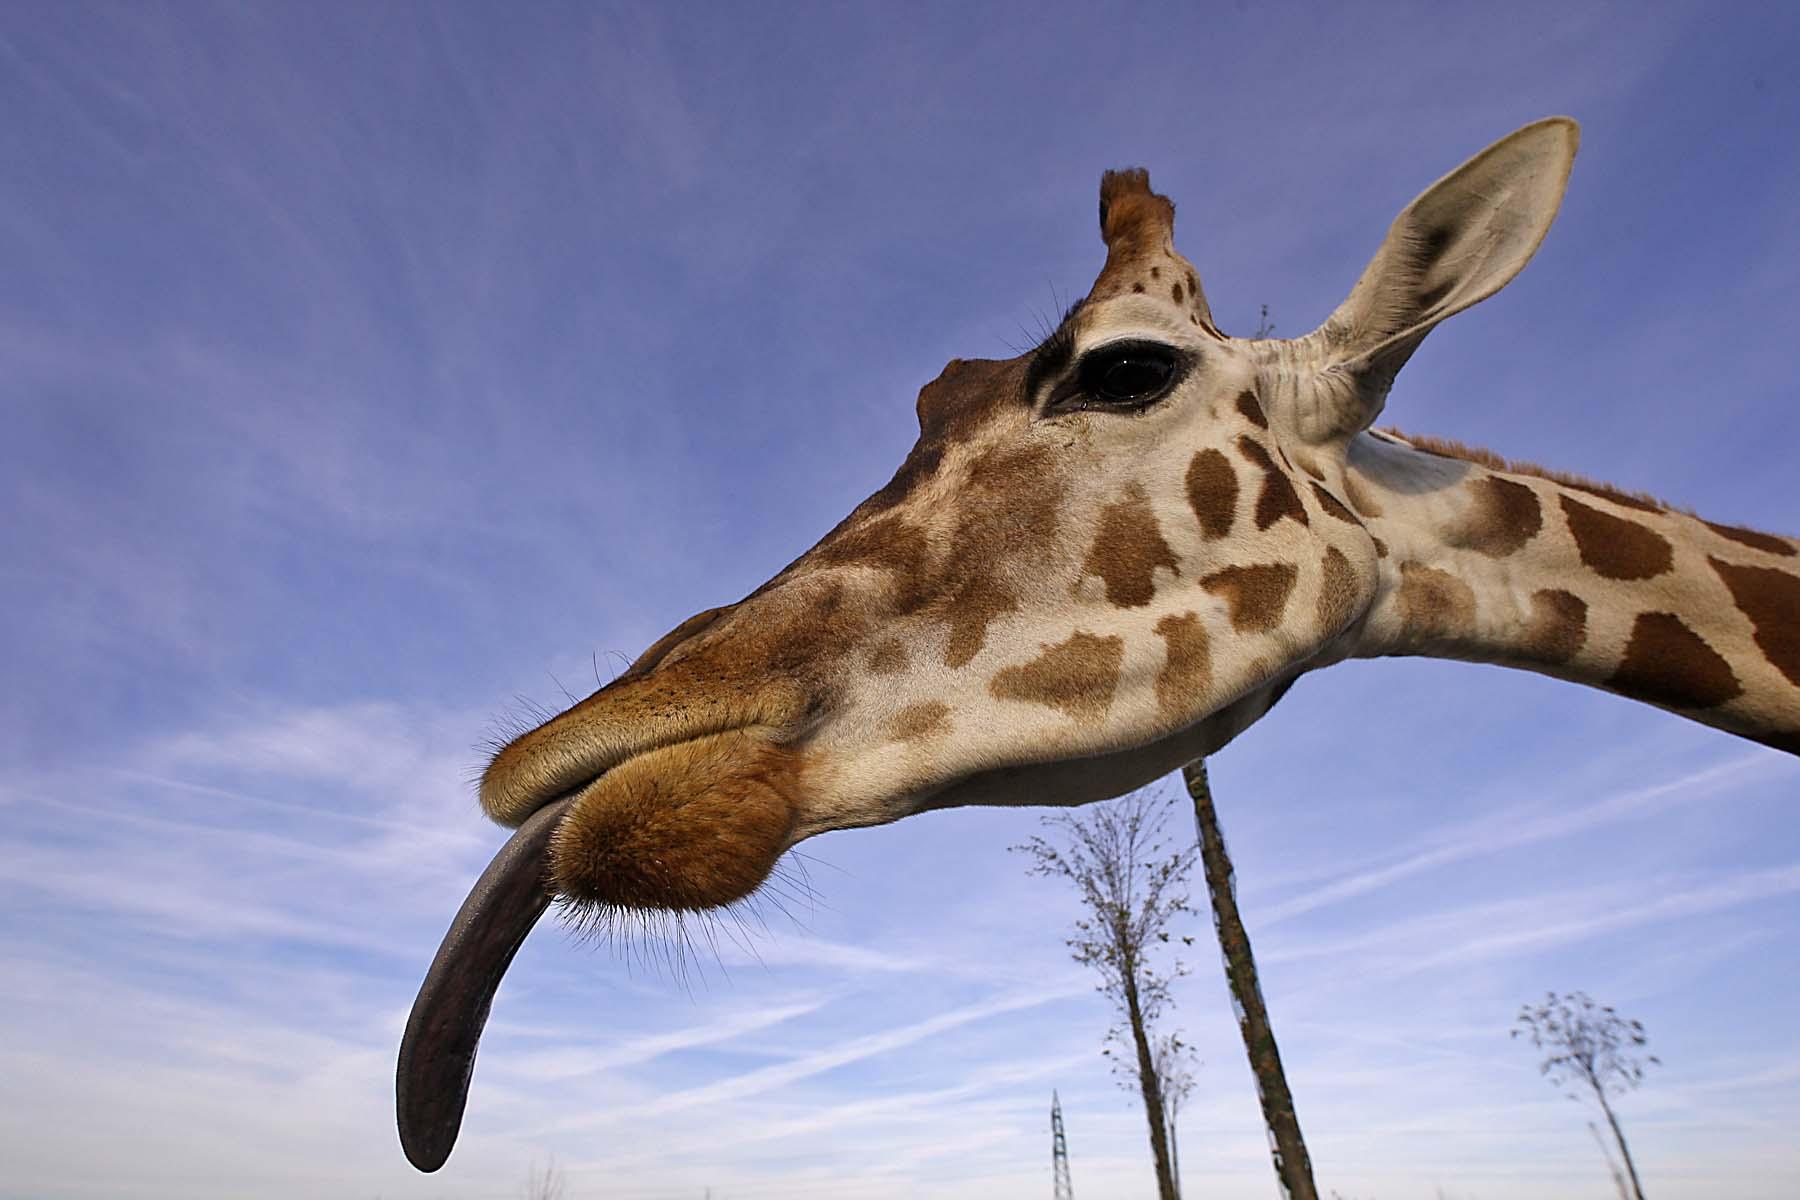 Giraffa safari ravenna loc mirabilandia for Immagini giraffa per bambini